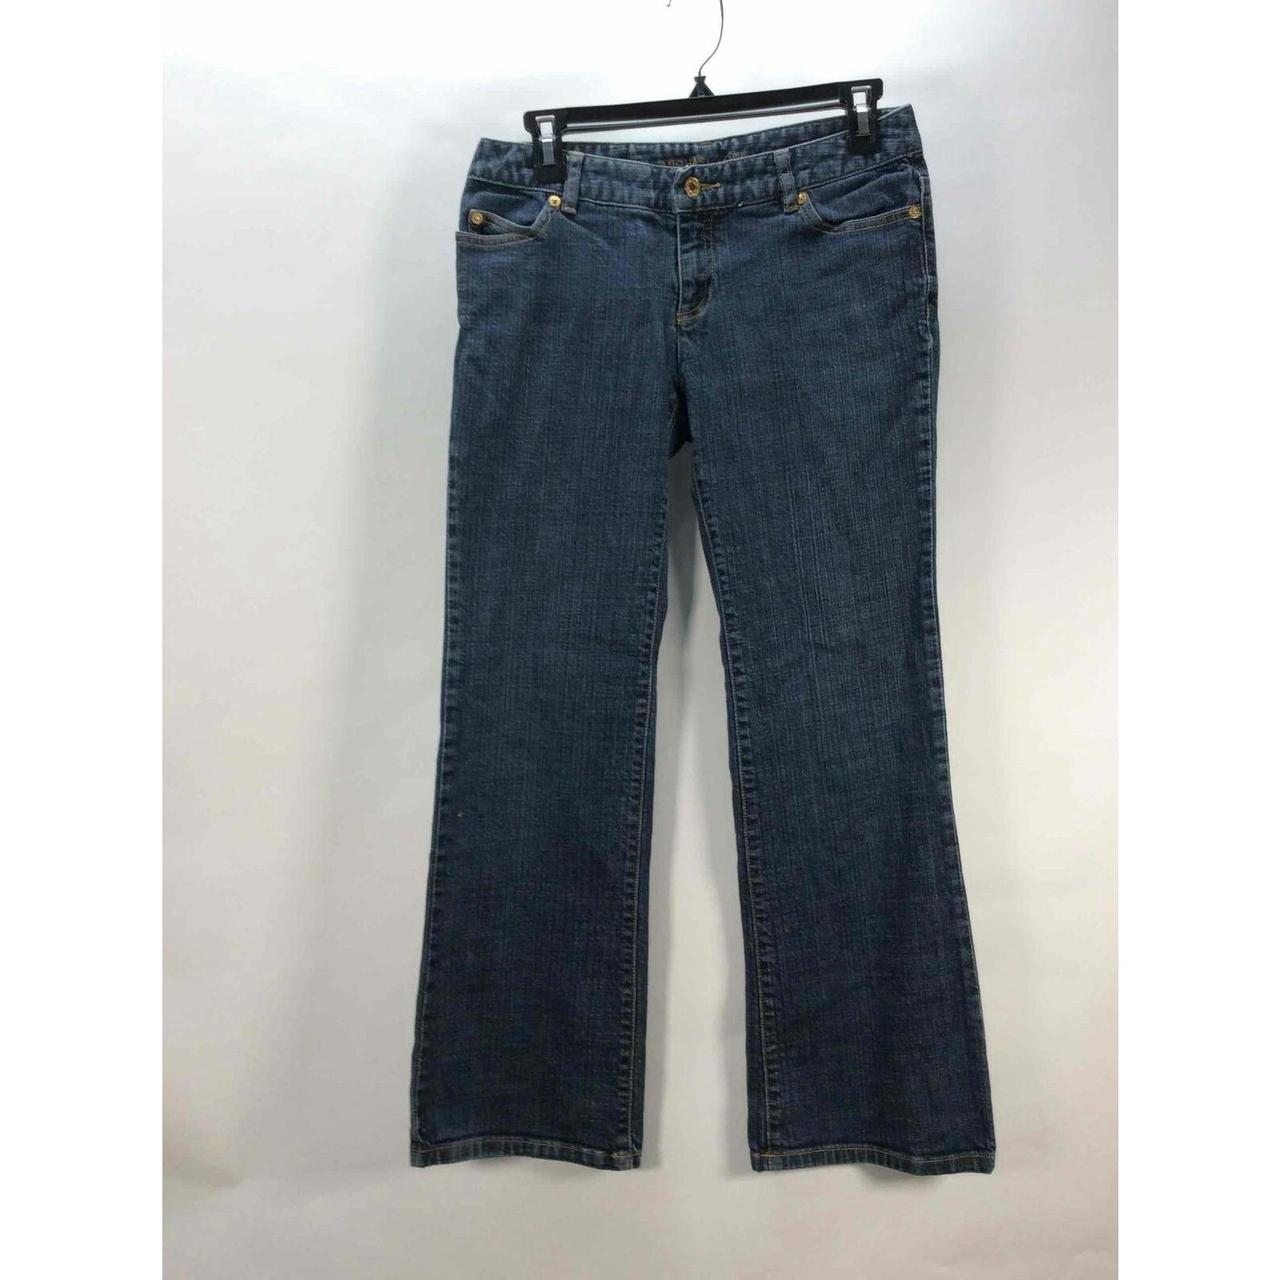 Product Image 1 - Michael Kors Blue 5 Pocket